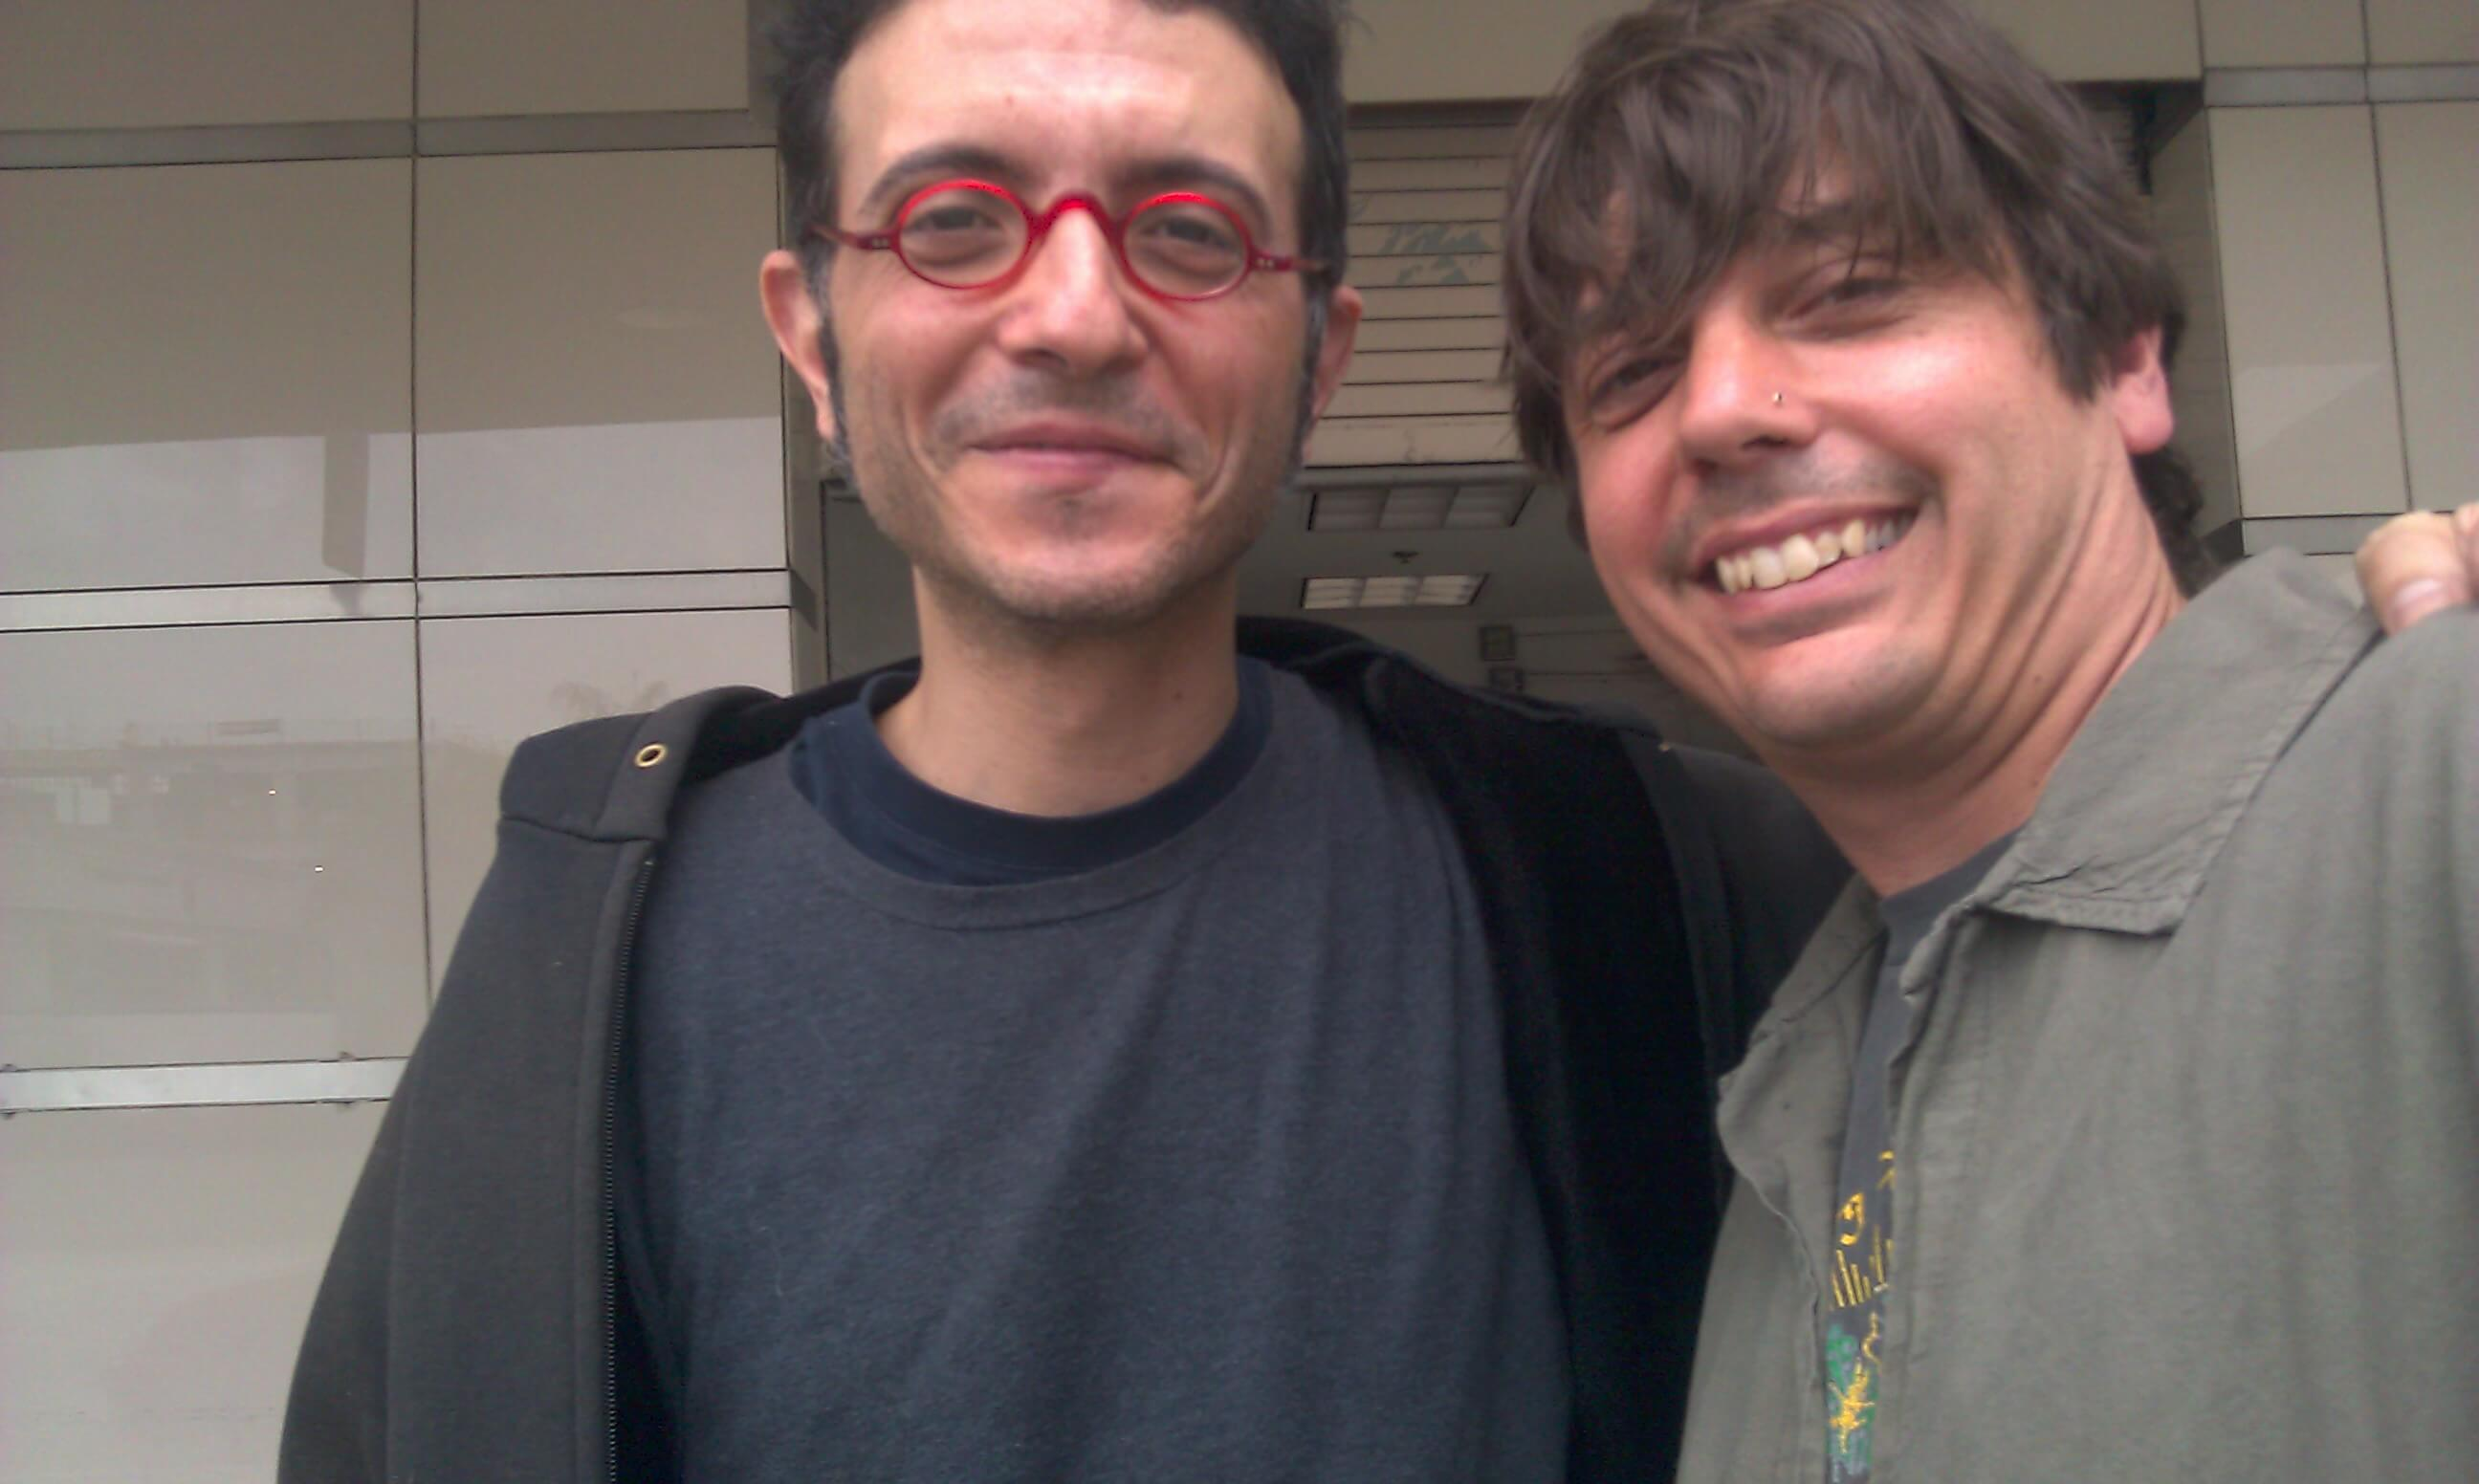 Ben Annand and Donato Dozzy